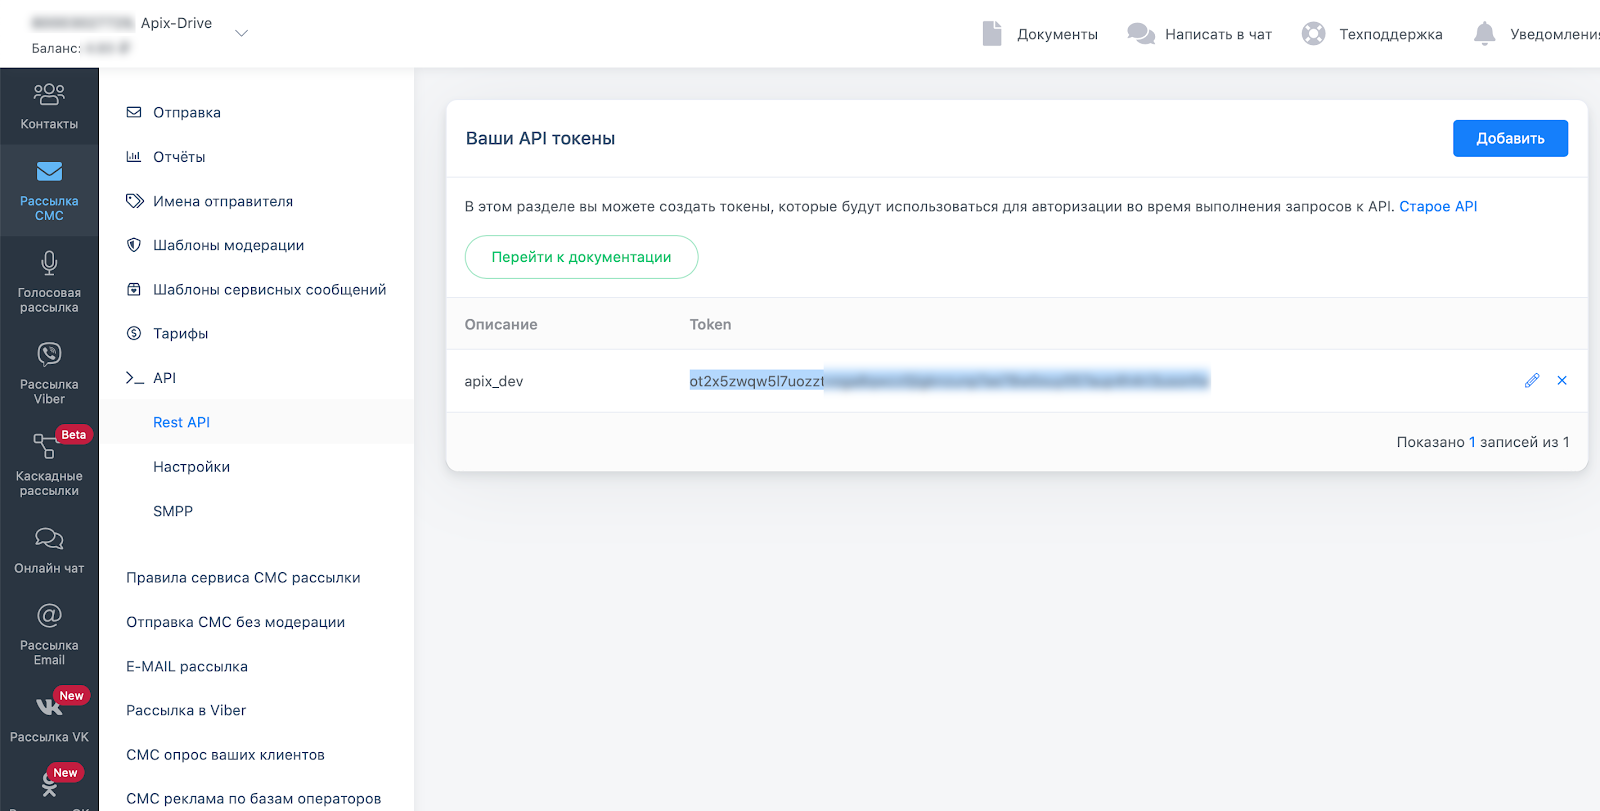 Настройка Приема данных в SMSprofi | Подключение по API